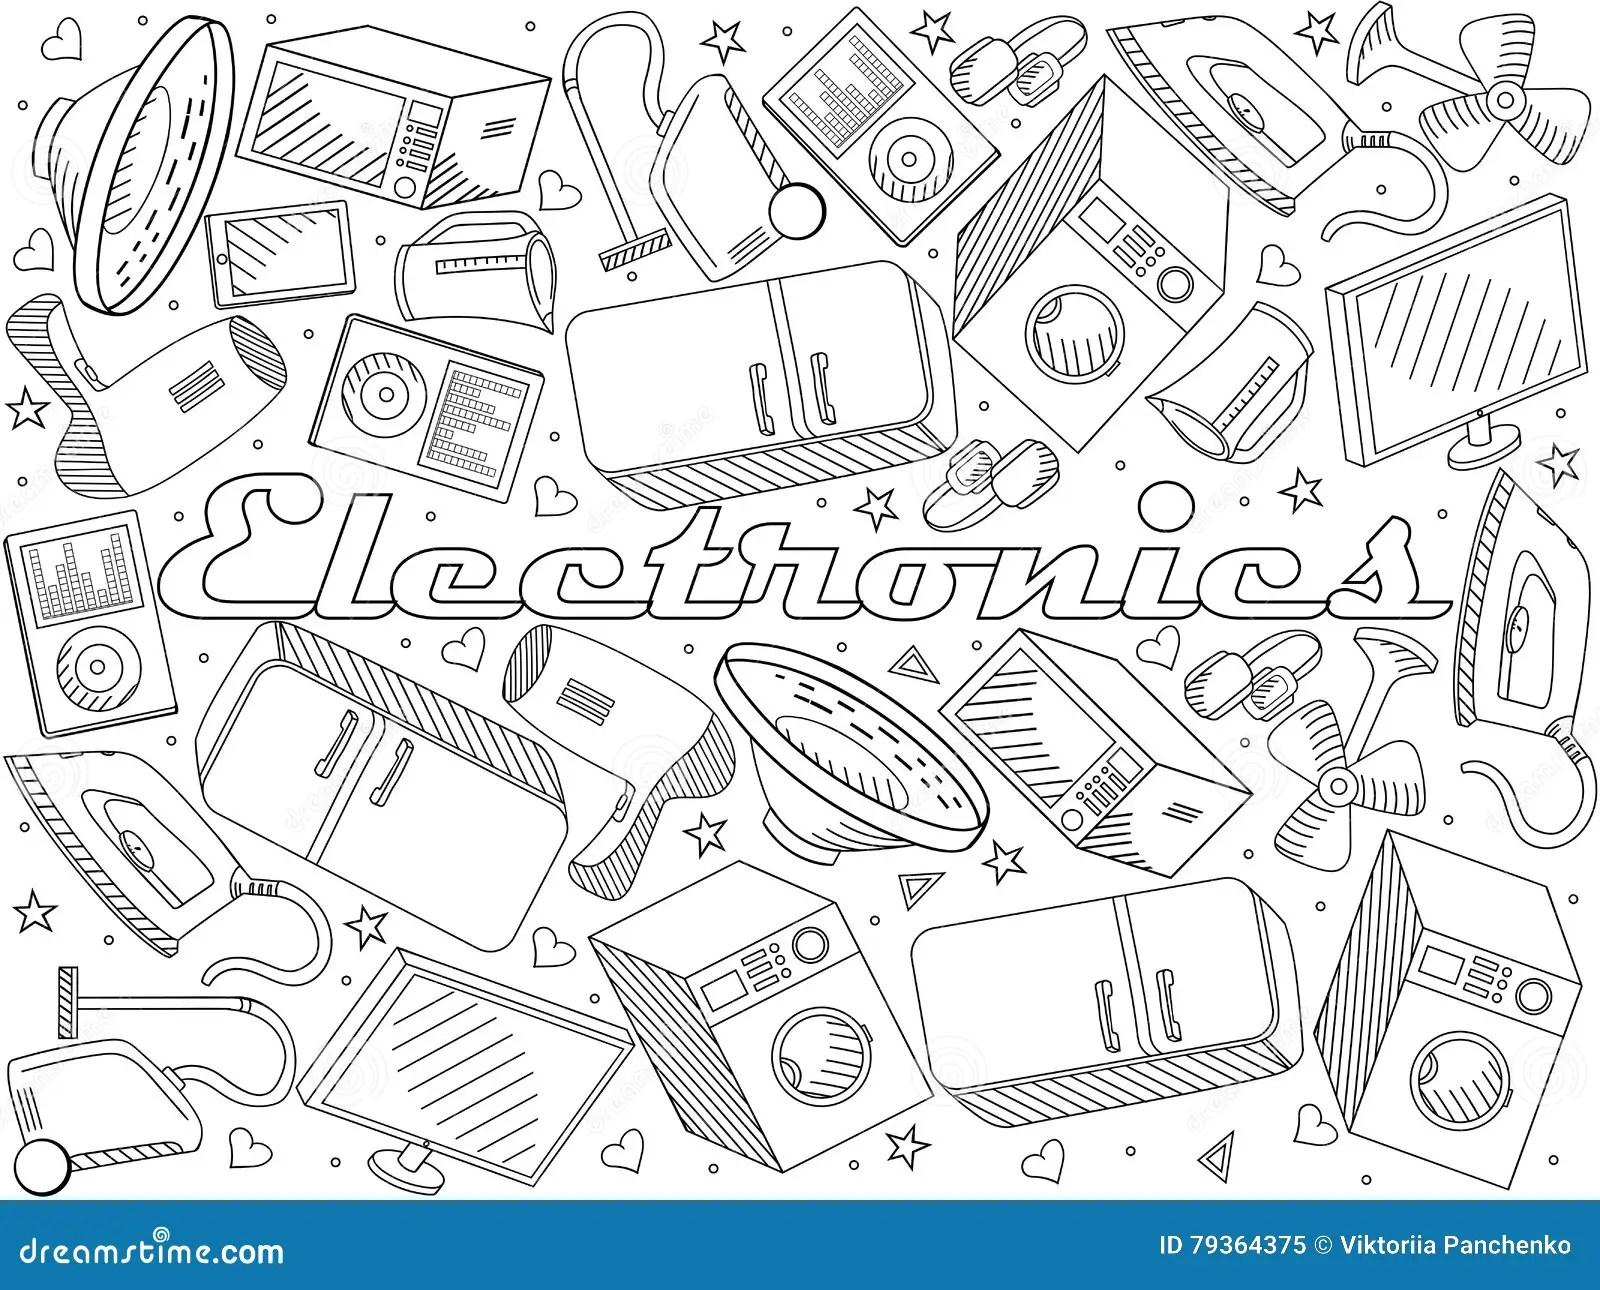 Electronics Line Art Design Vector Illustration Stock